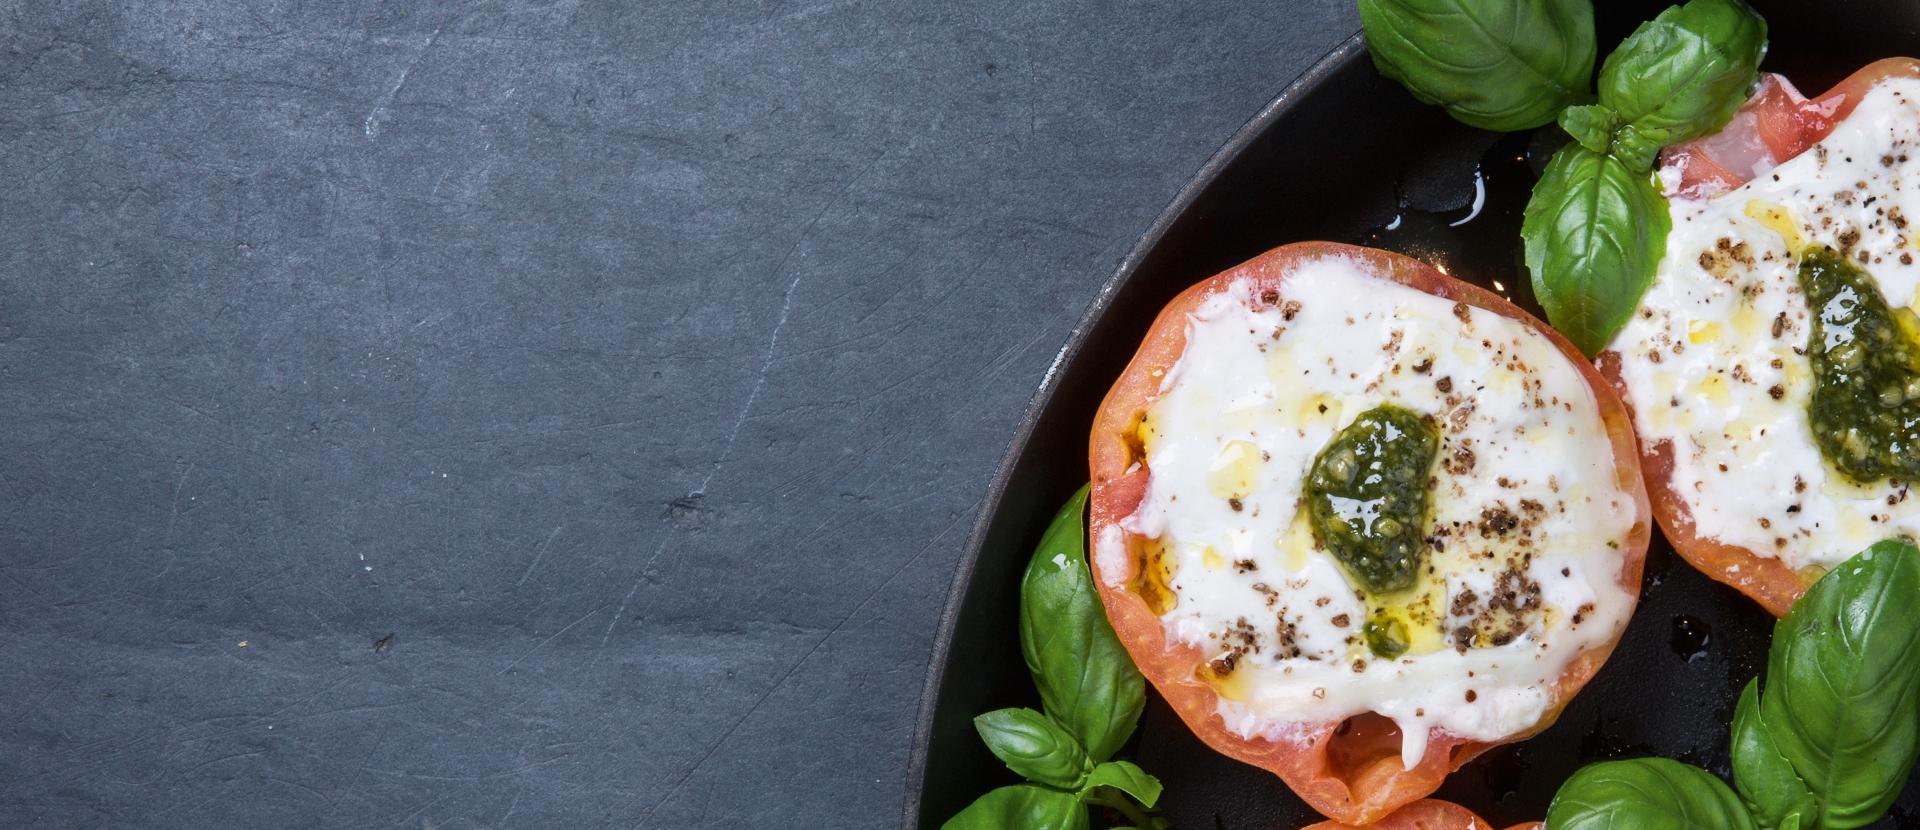 Gebackene Tomate mit Mozzarella